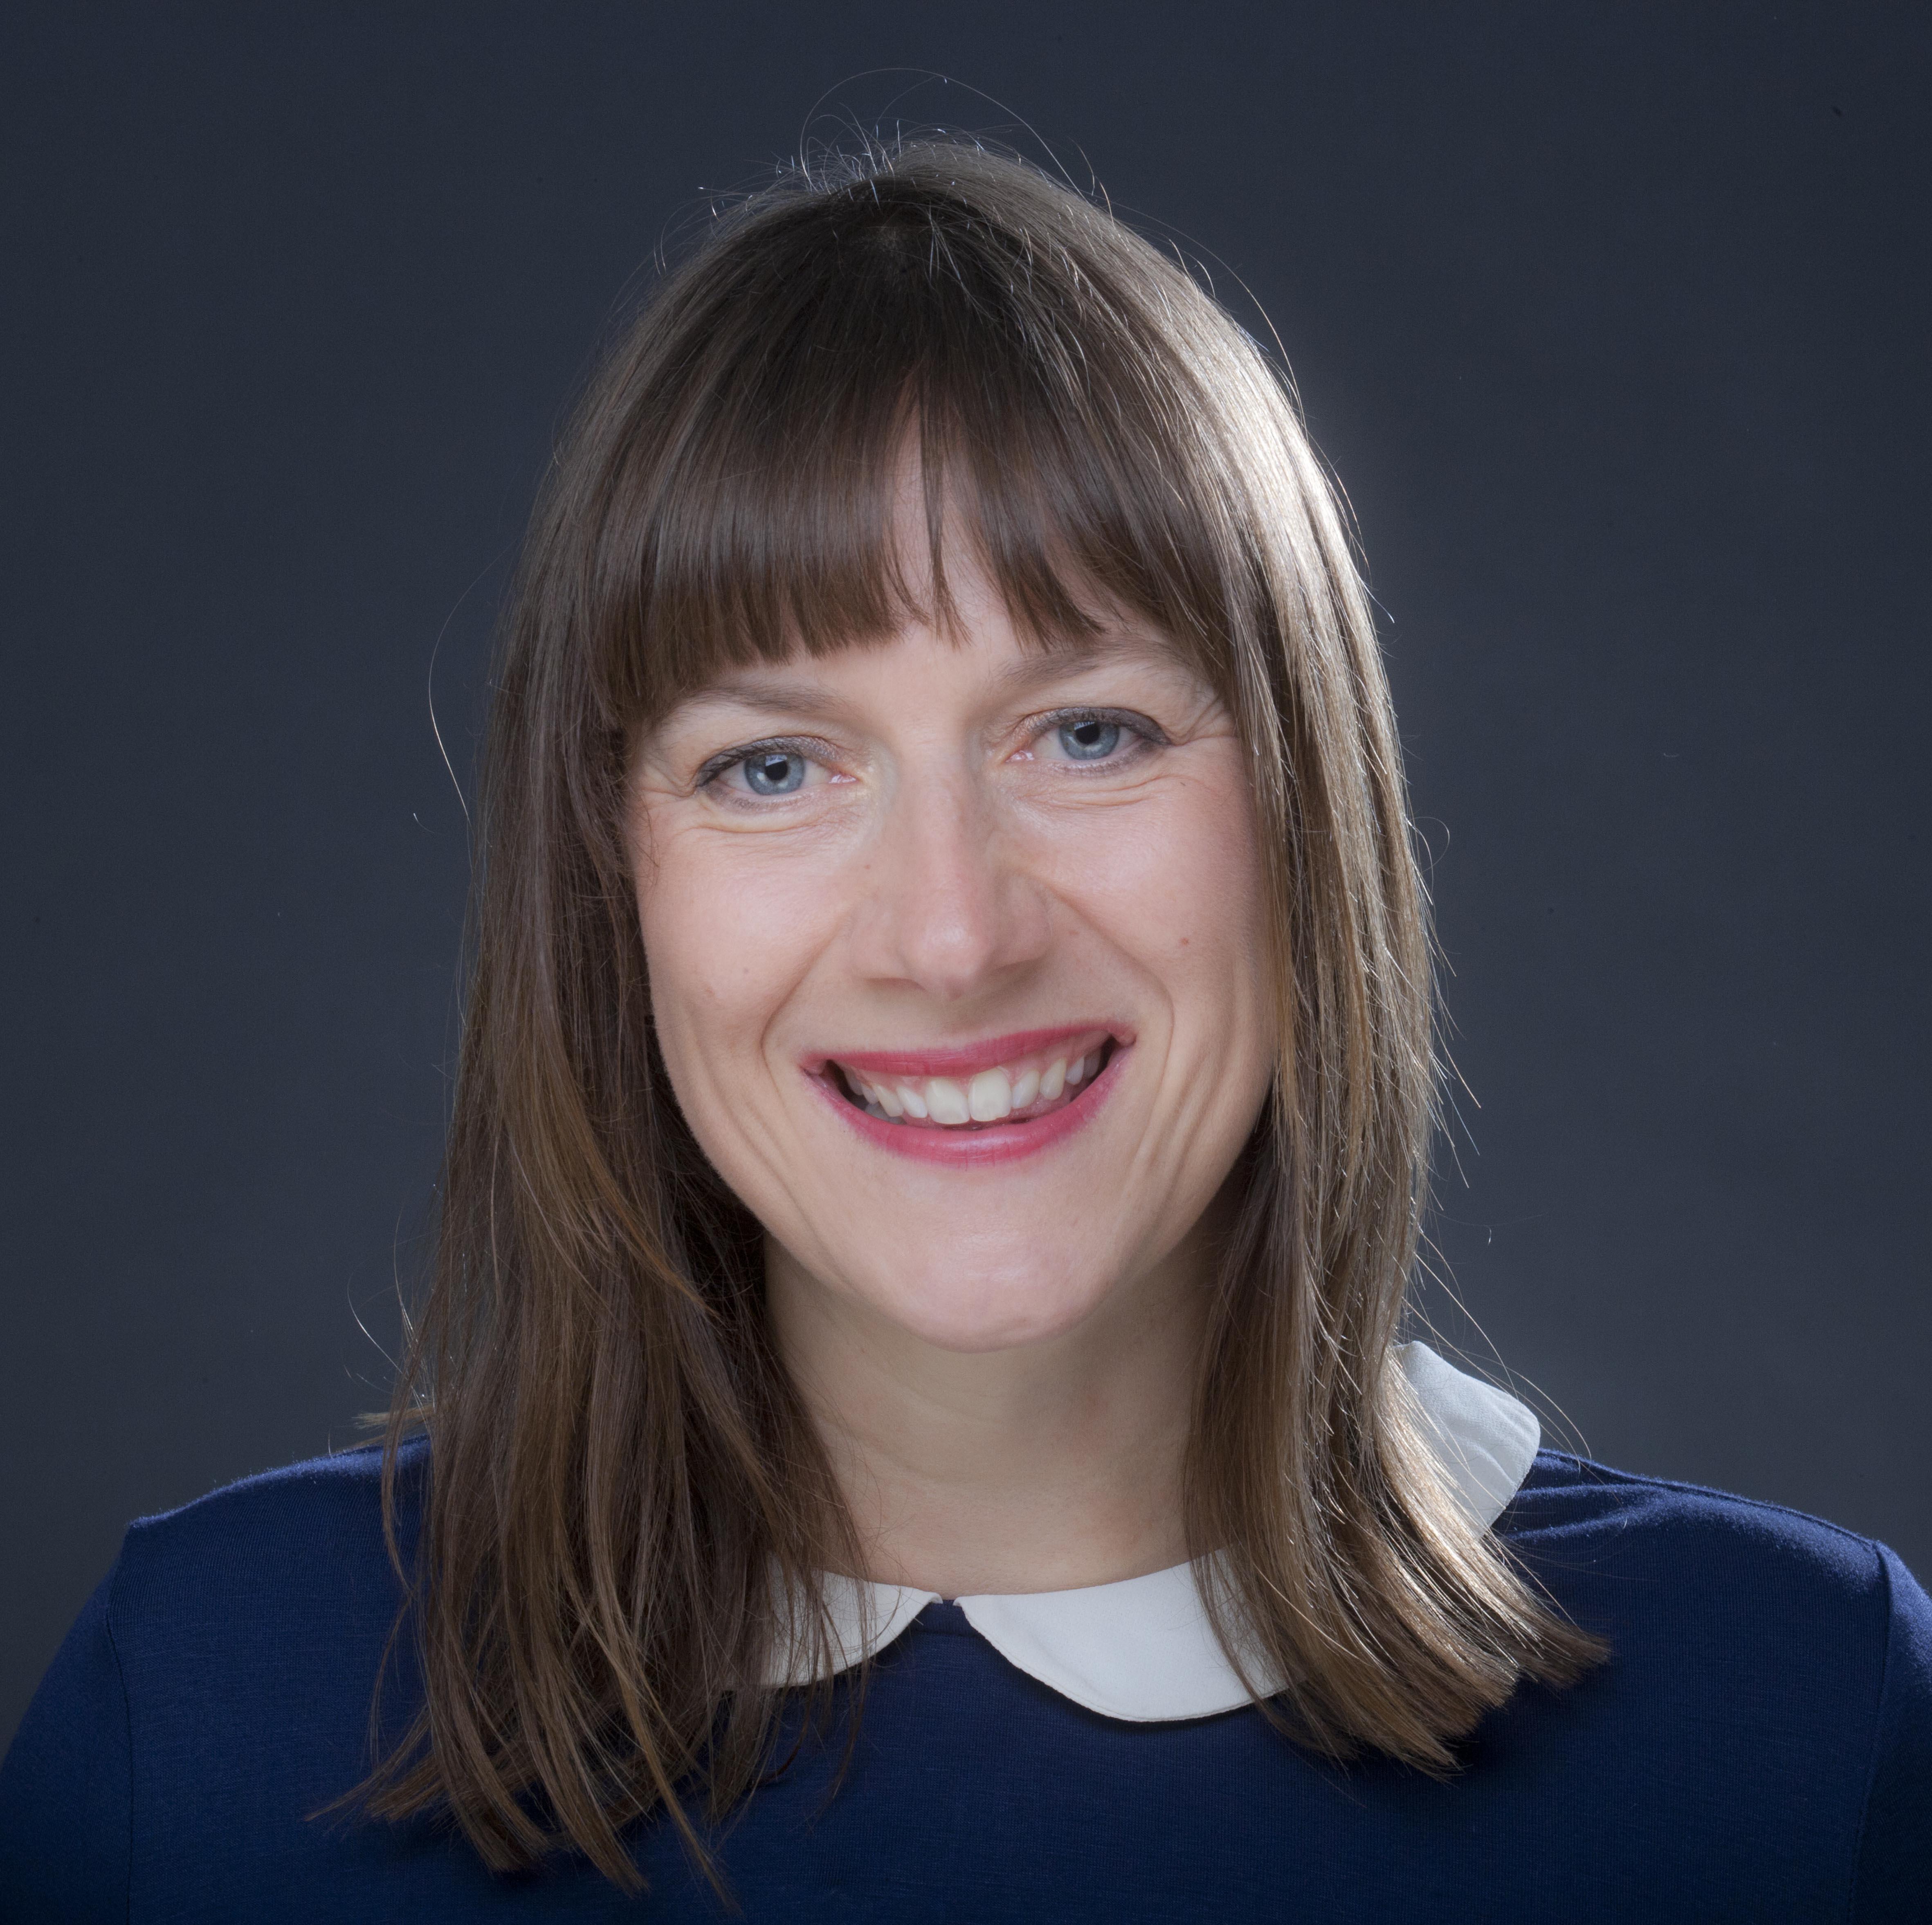 Anna McLoughlin